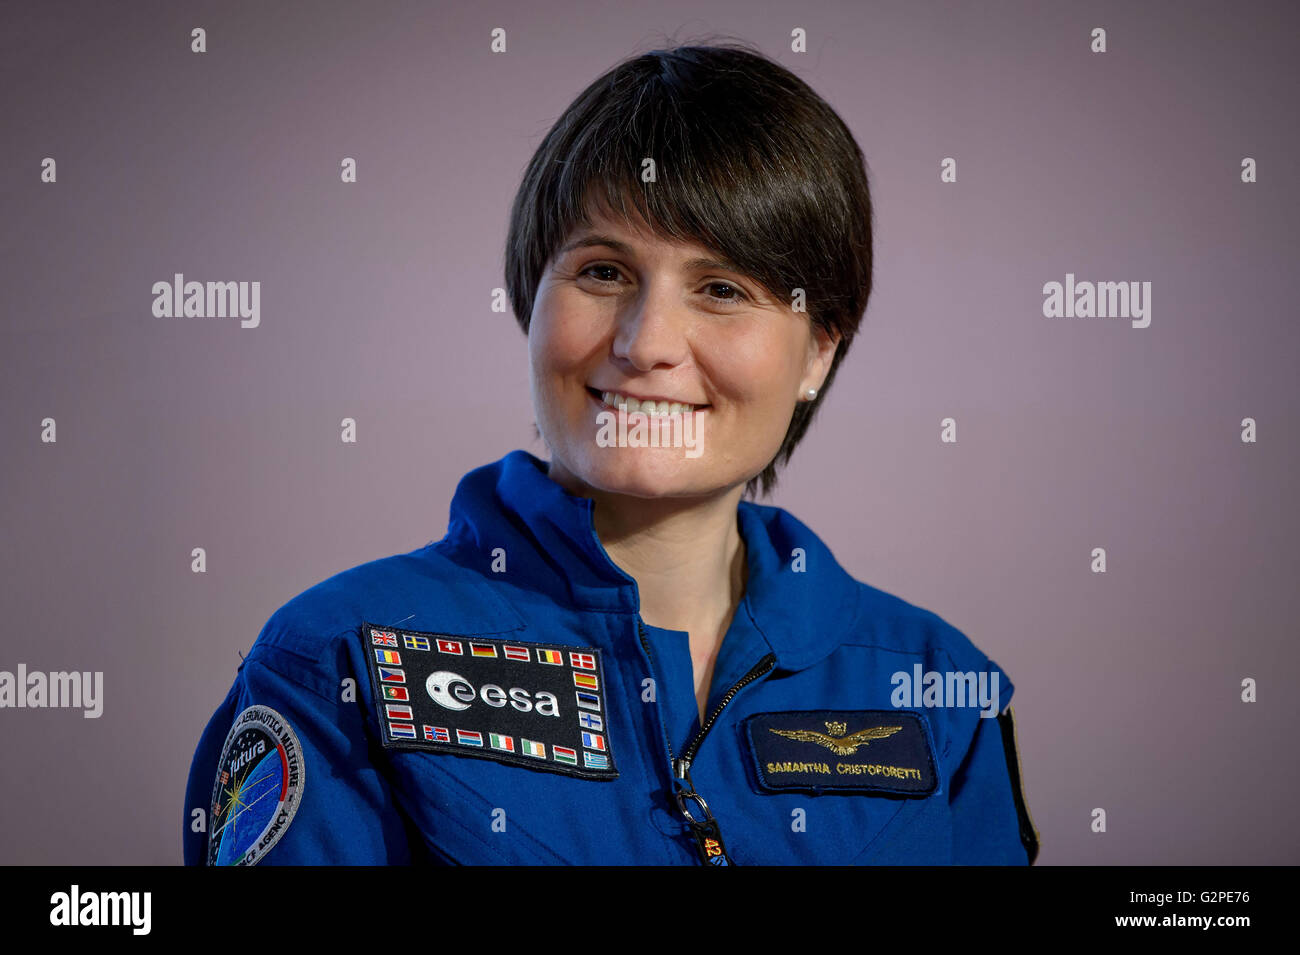 Astronaut Samantha Cristoforetti of ESA (European Space Agency) - Stock Image